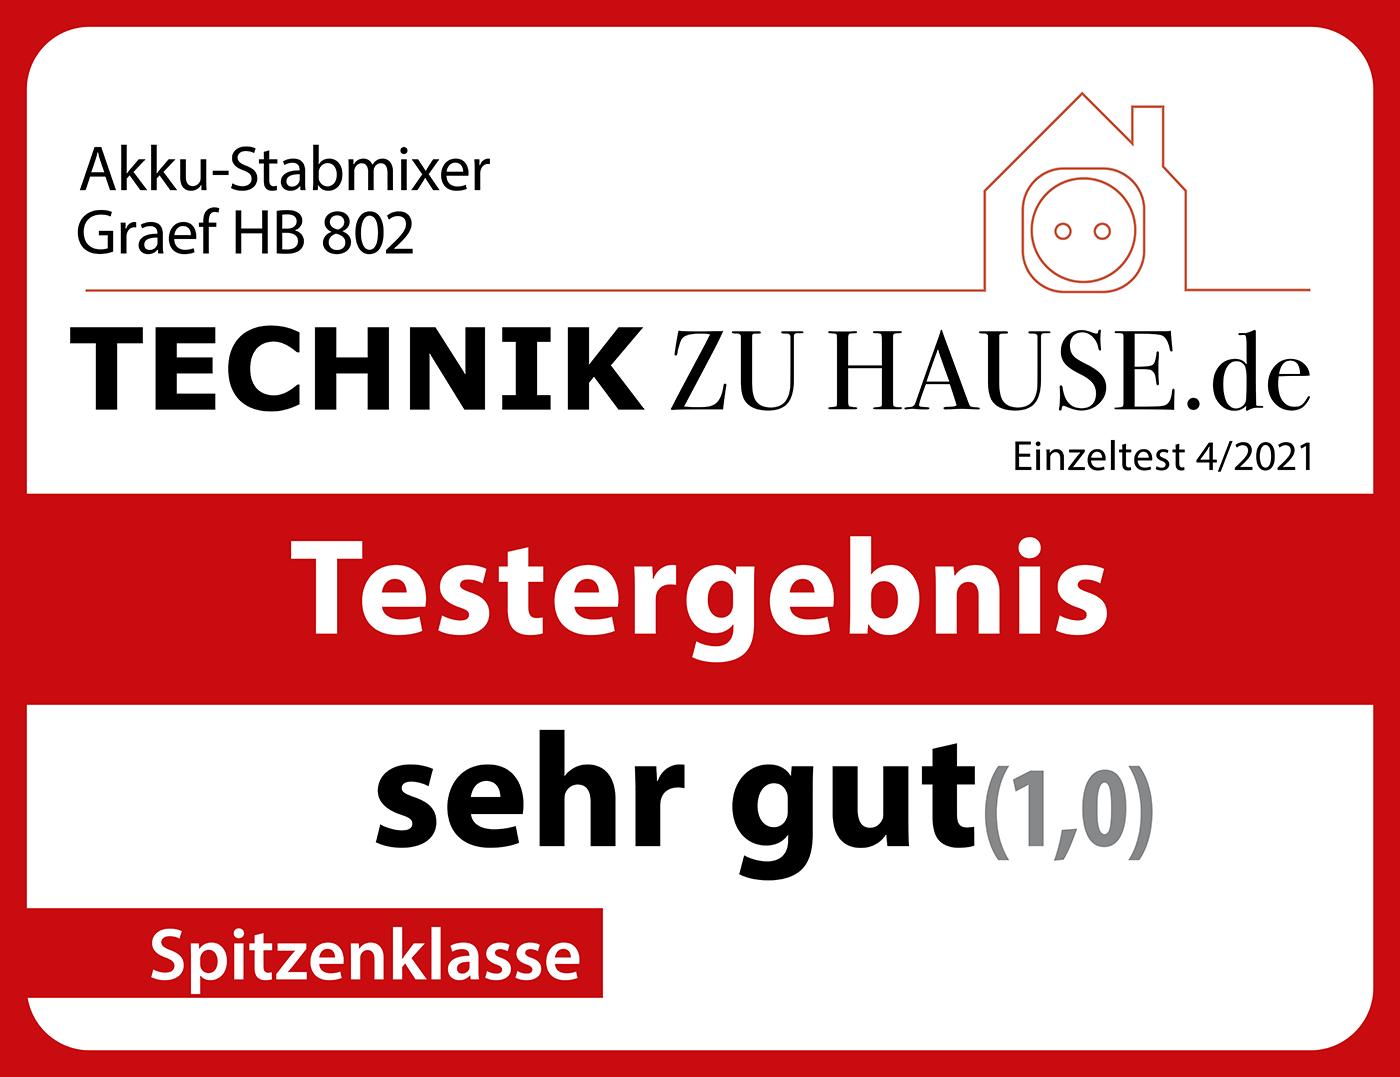 HB802 - TECHNIK ZU HAUSE.de (4/2021)